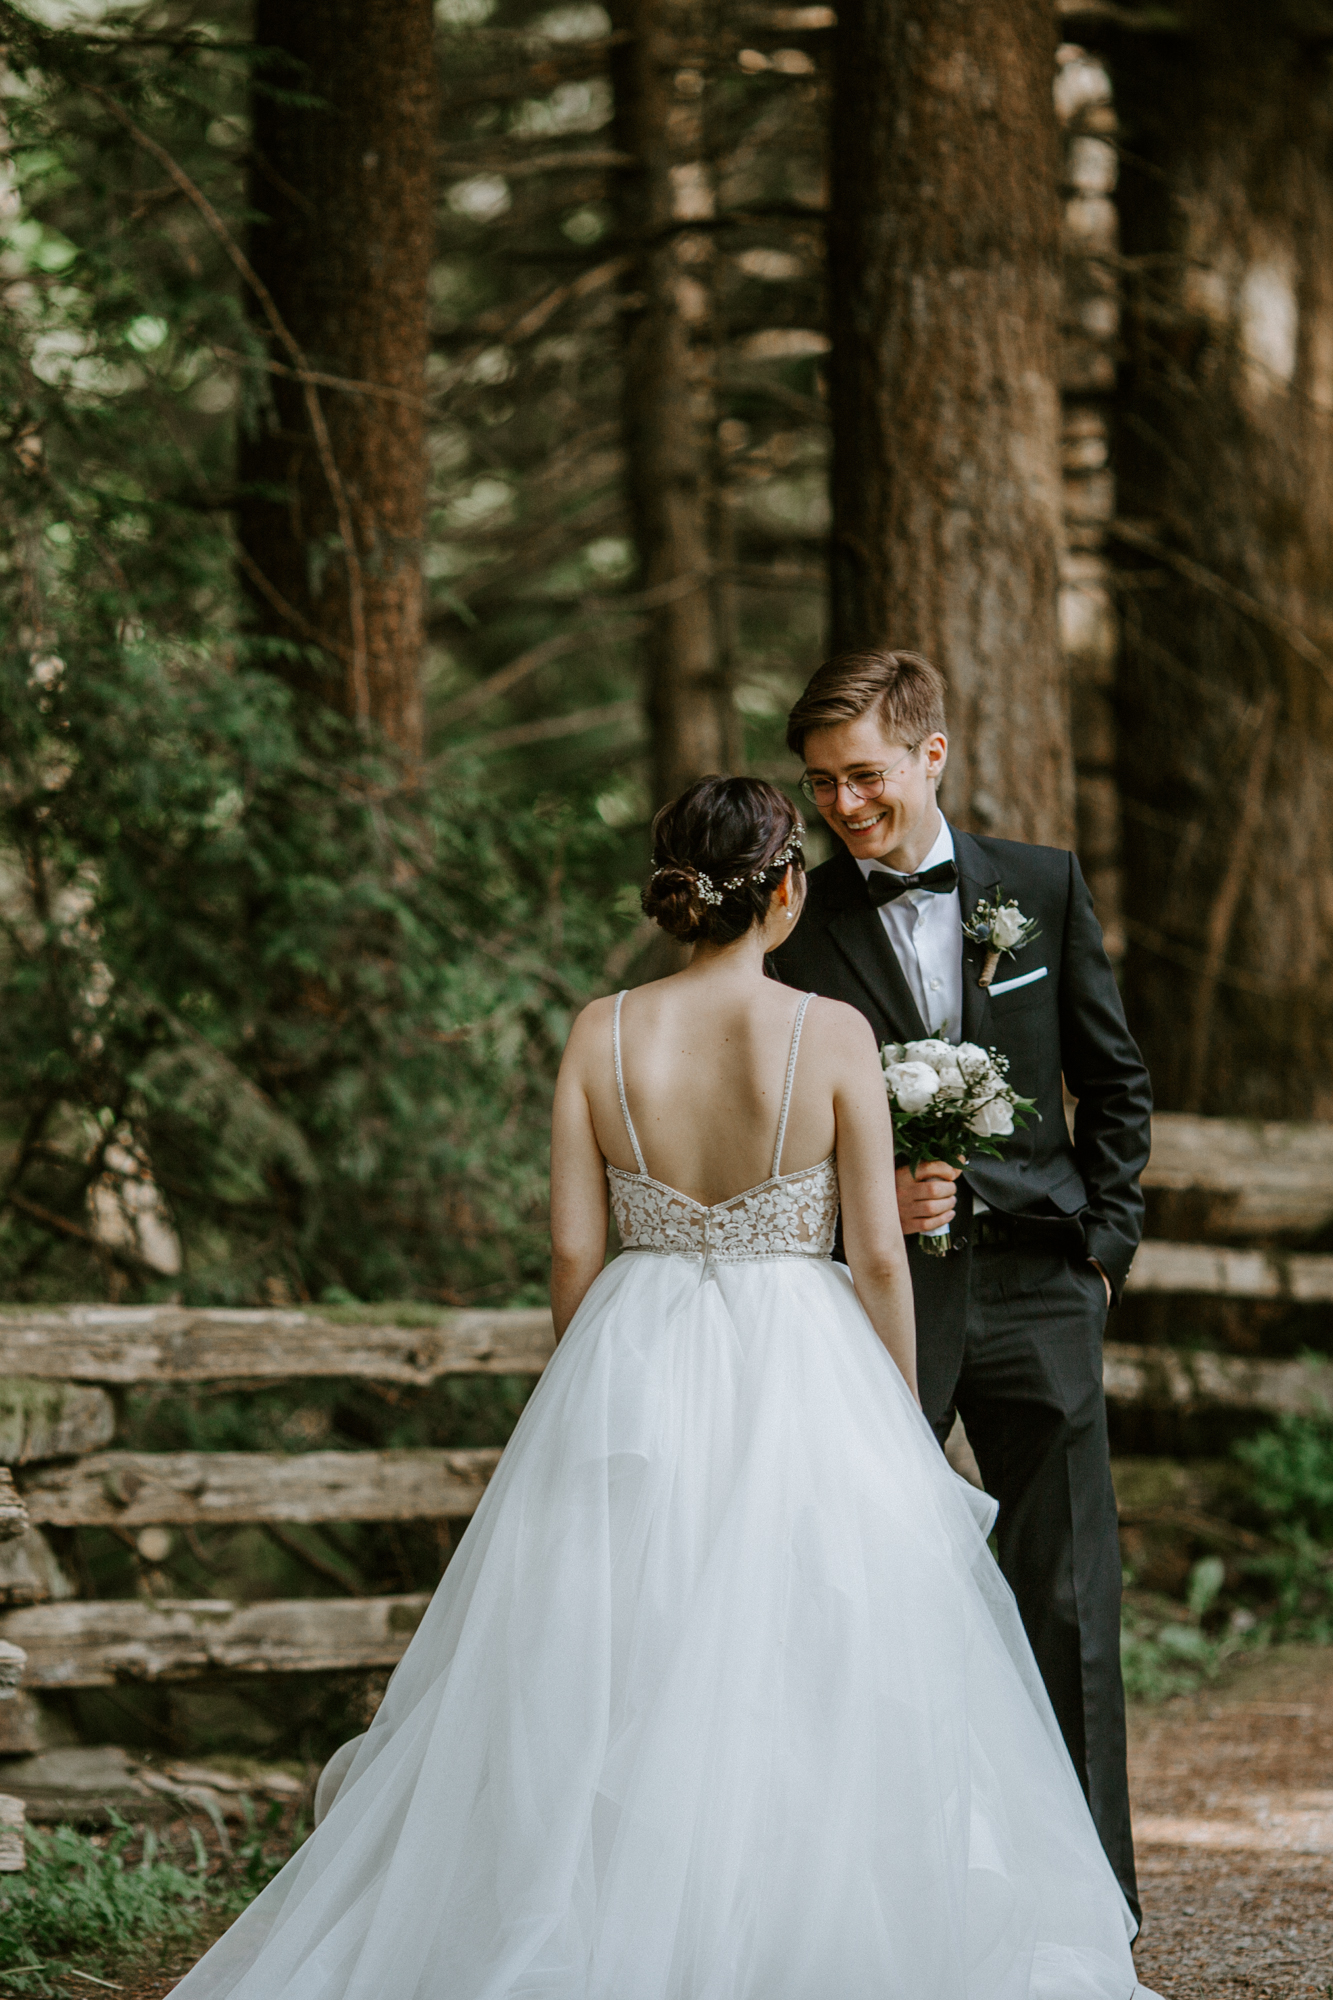 Yelim& Sorin- Wedding Day- HL-SD-53.JPG